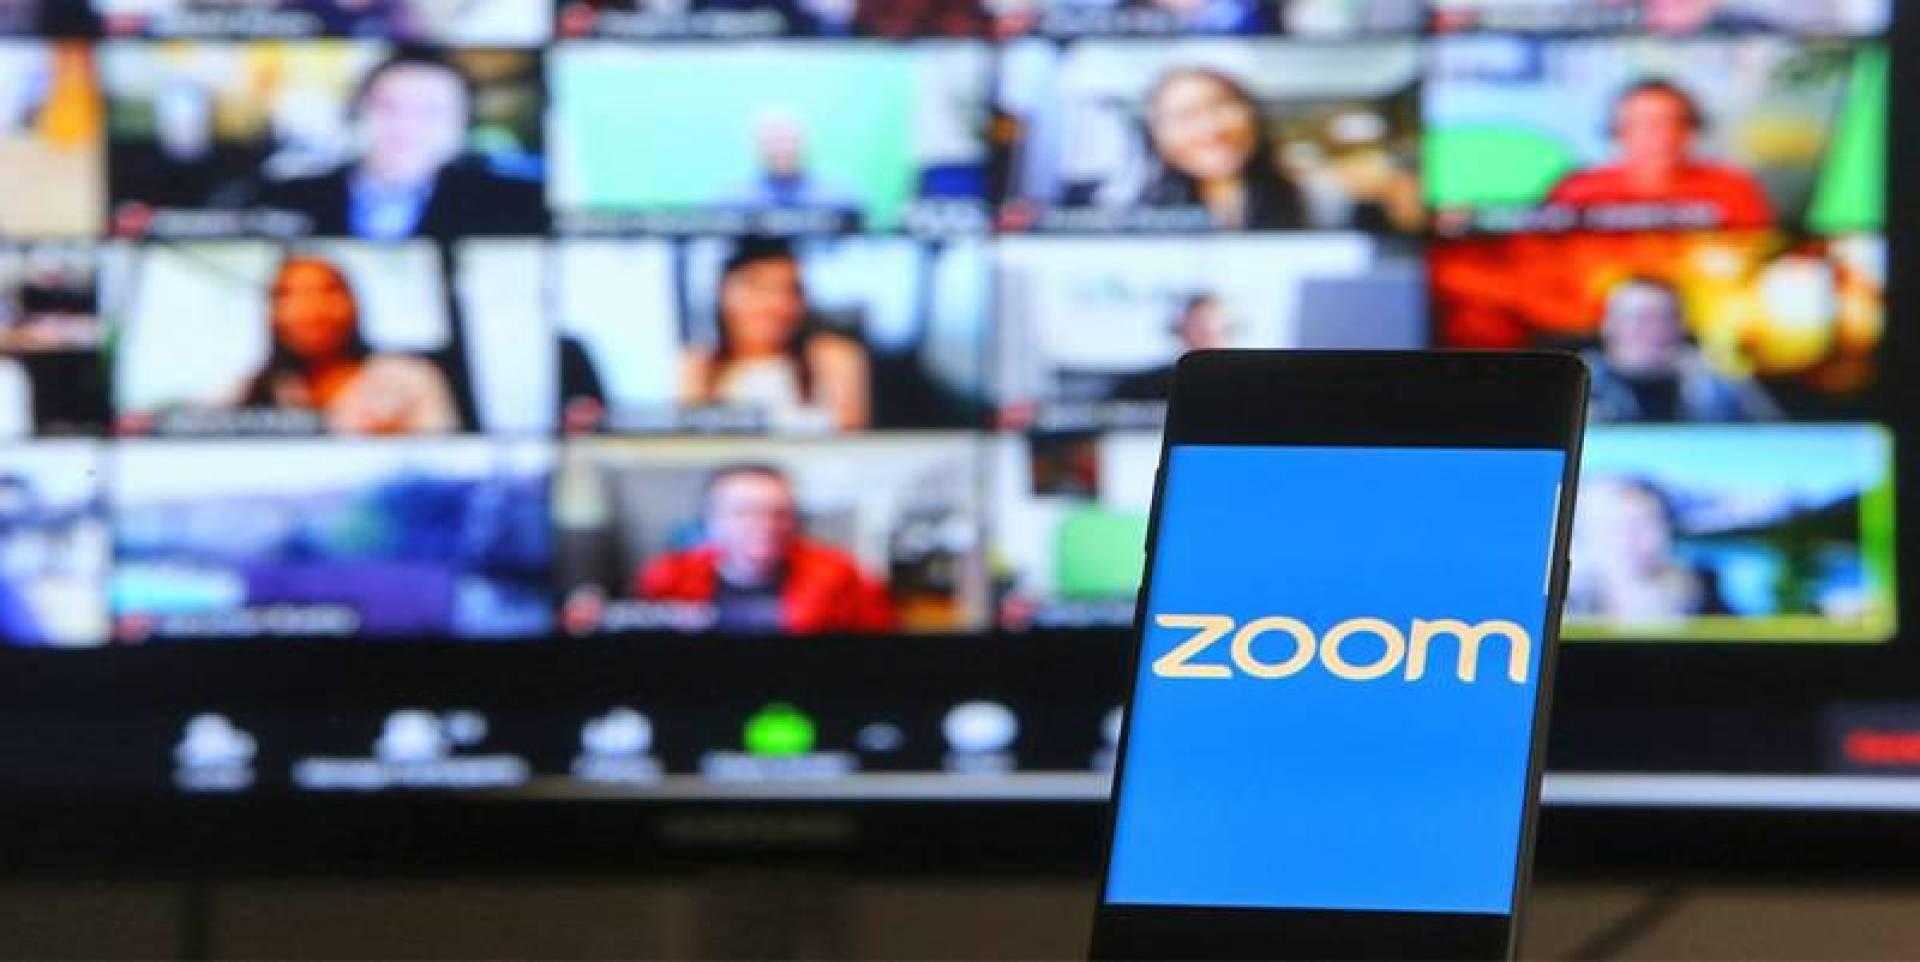 «Zoom» يتوسع ويستضيف فعاليات افتراضية